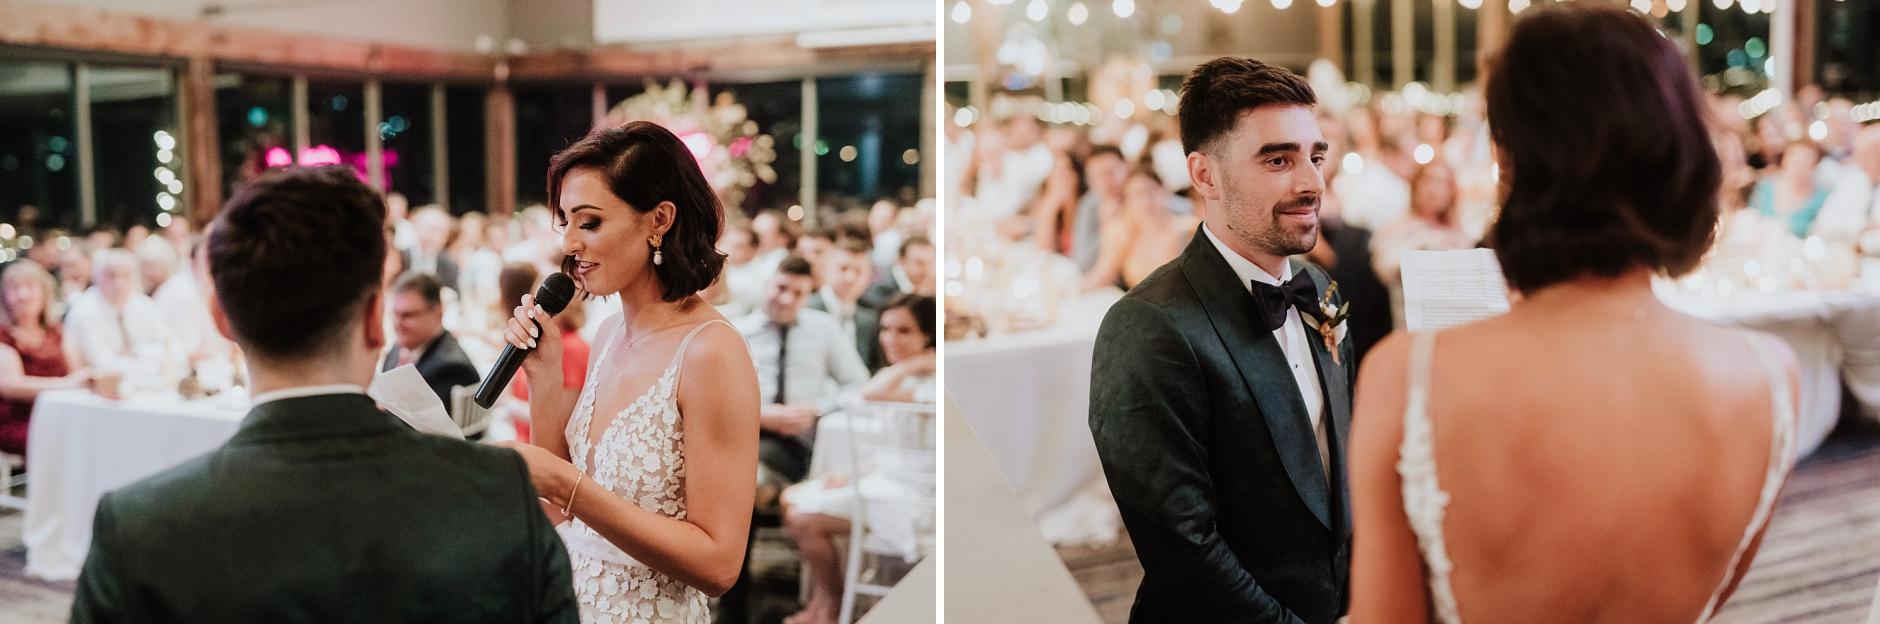 Sydney-Wedding-Photographer_0167.jpg